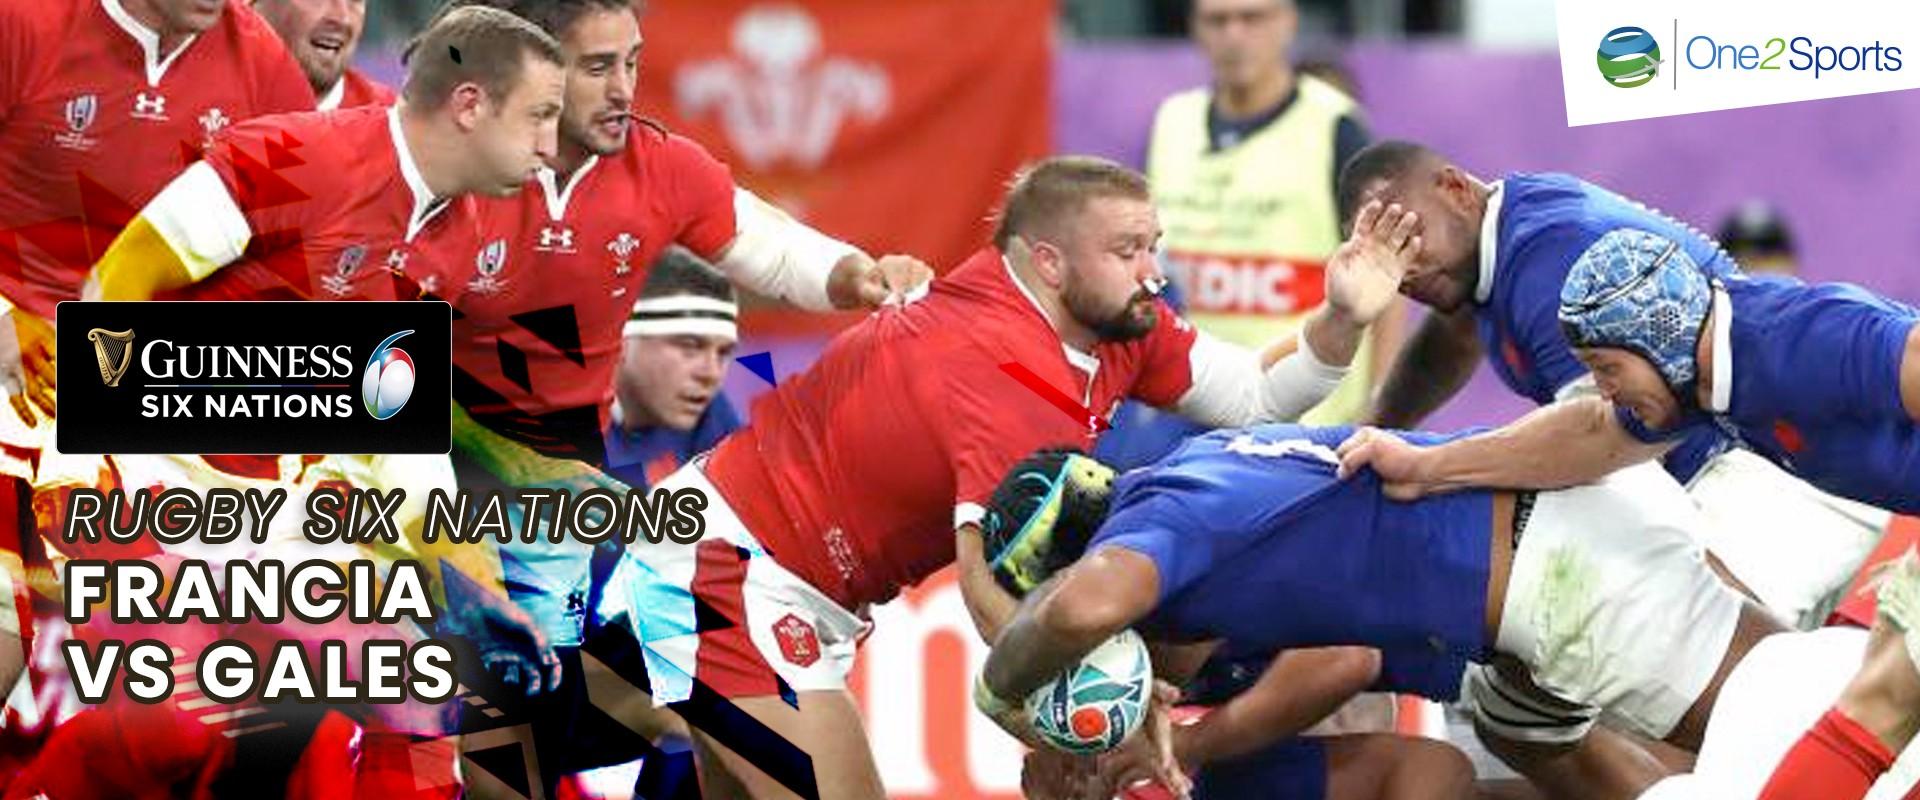 Francia vs Gales